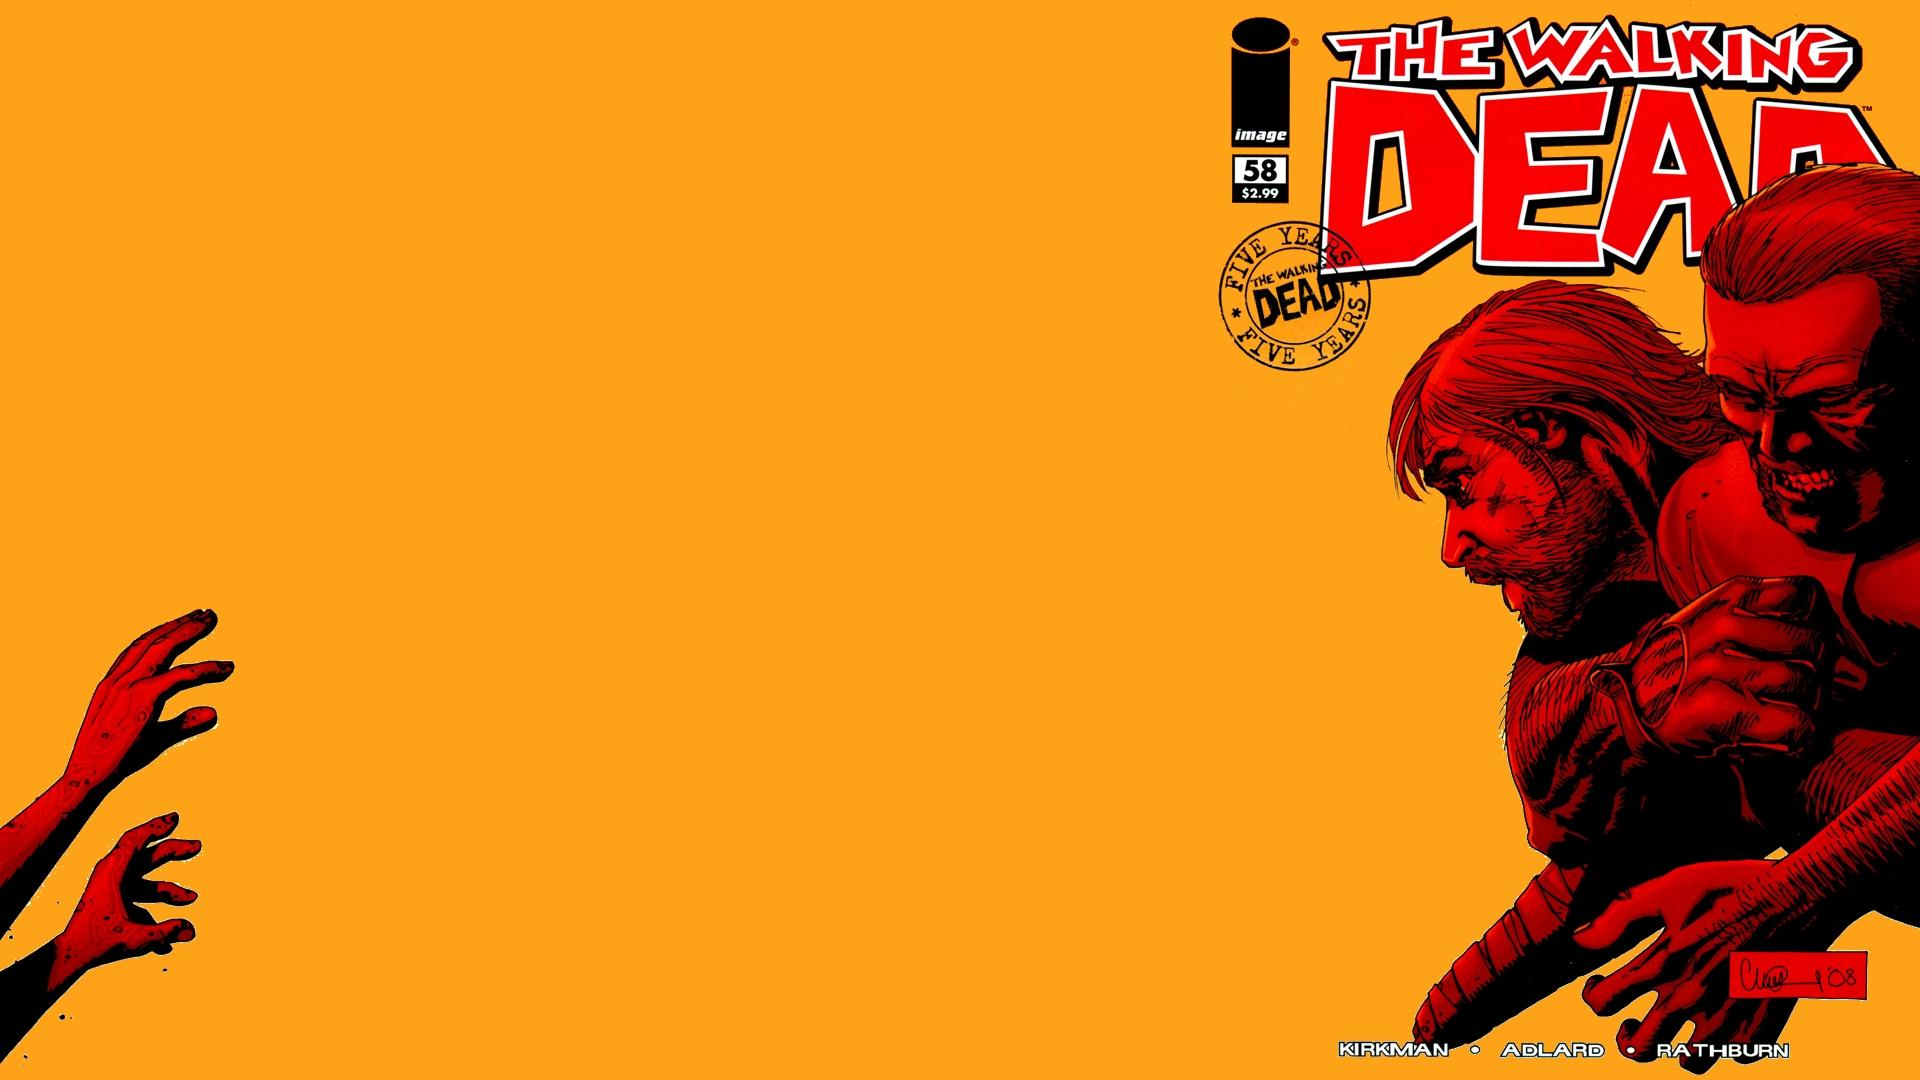 The Walking Dead Hd Wallpaper Background Image 1920x1080 Id